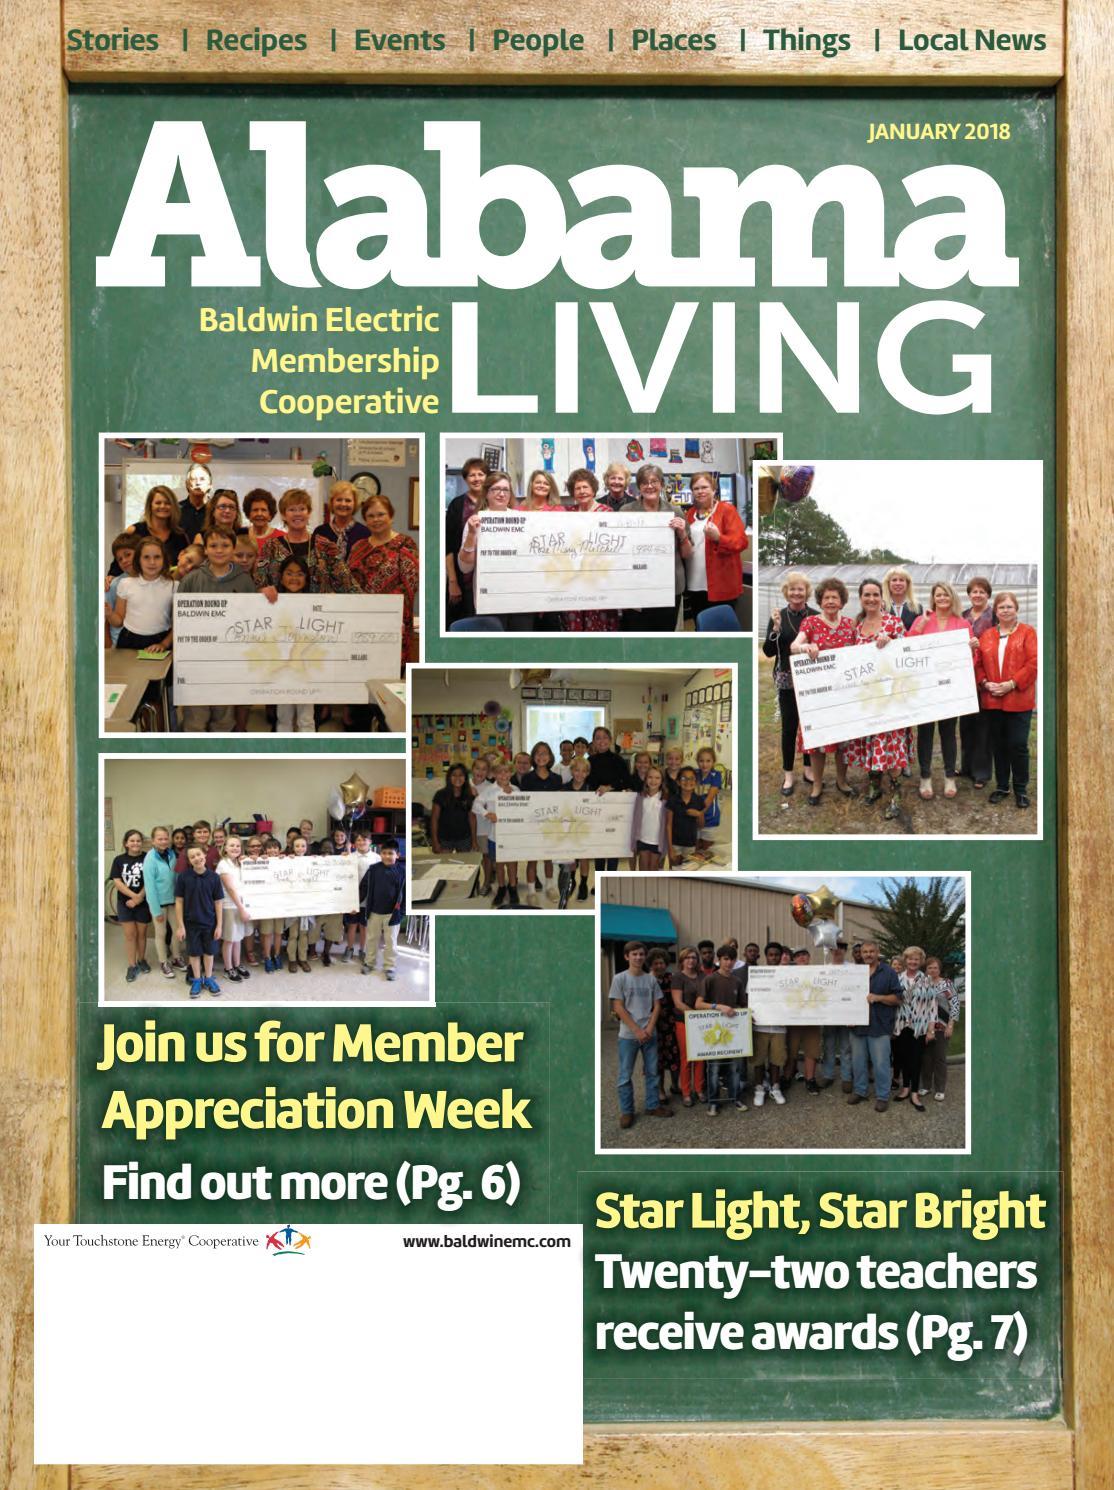 46b4825d2ff9a January 2018 baldwin by Alabama Living - issuu